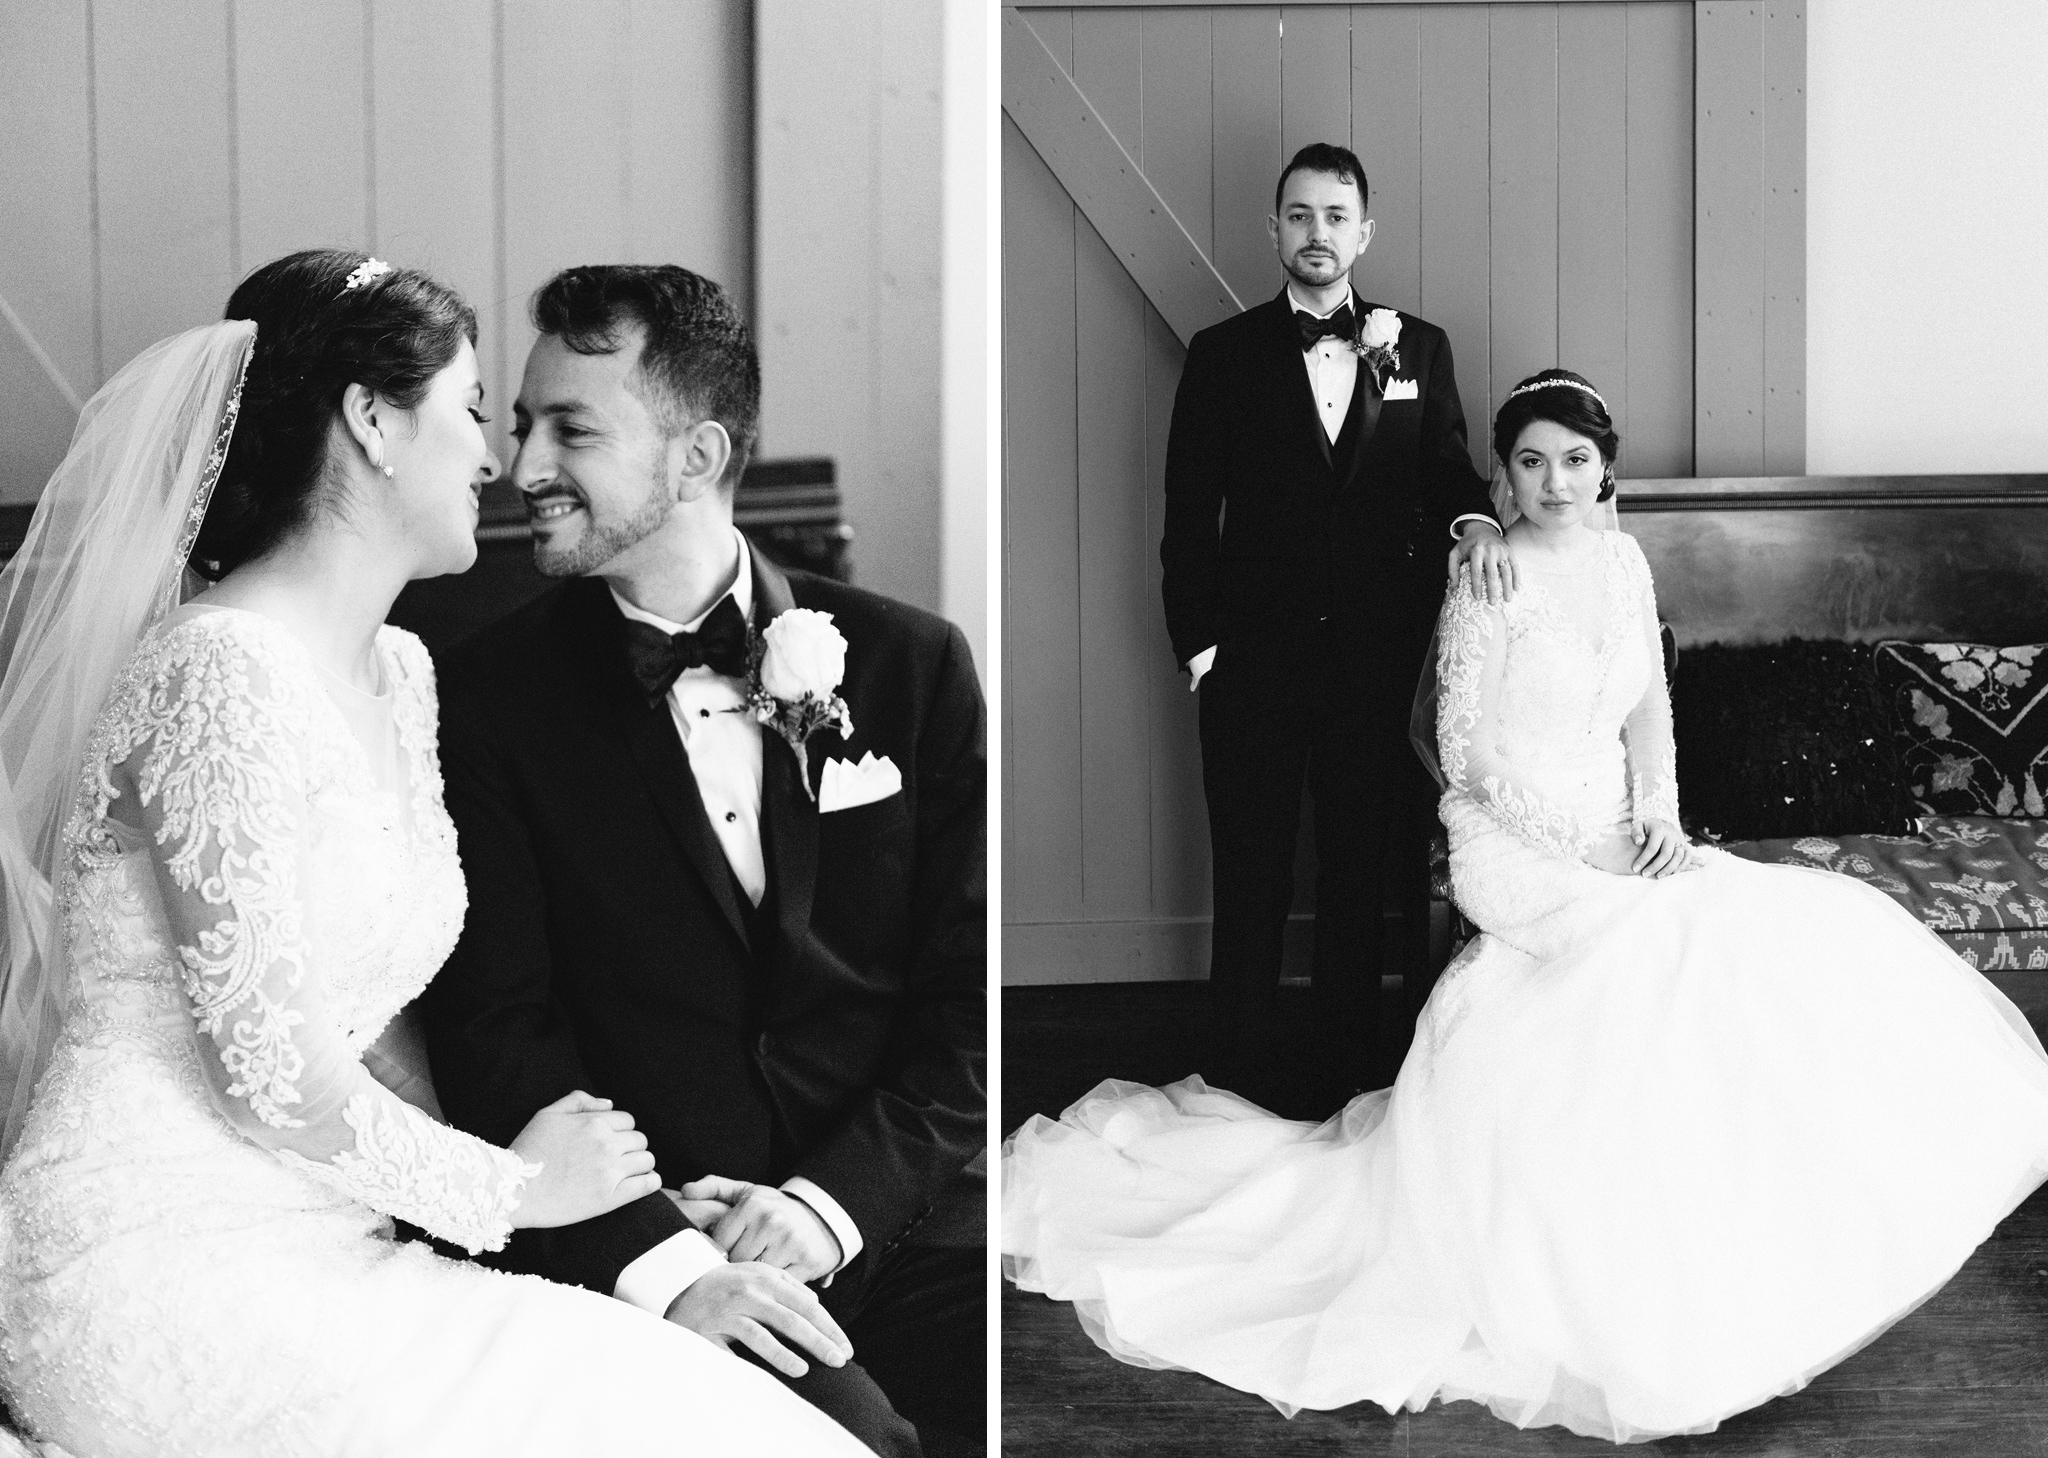 030-rempel-photography-chicago-wedding-inspiration-susan-daniel-michigan-metro-detroit-christian-church-holly-vault-cupcakes-and-kisses.jpg